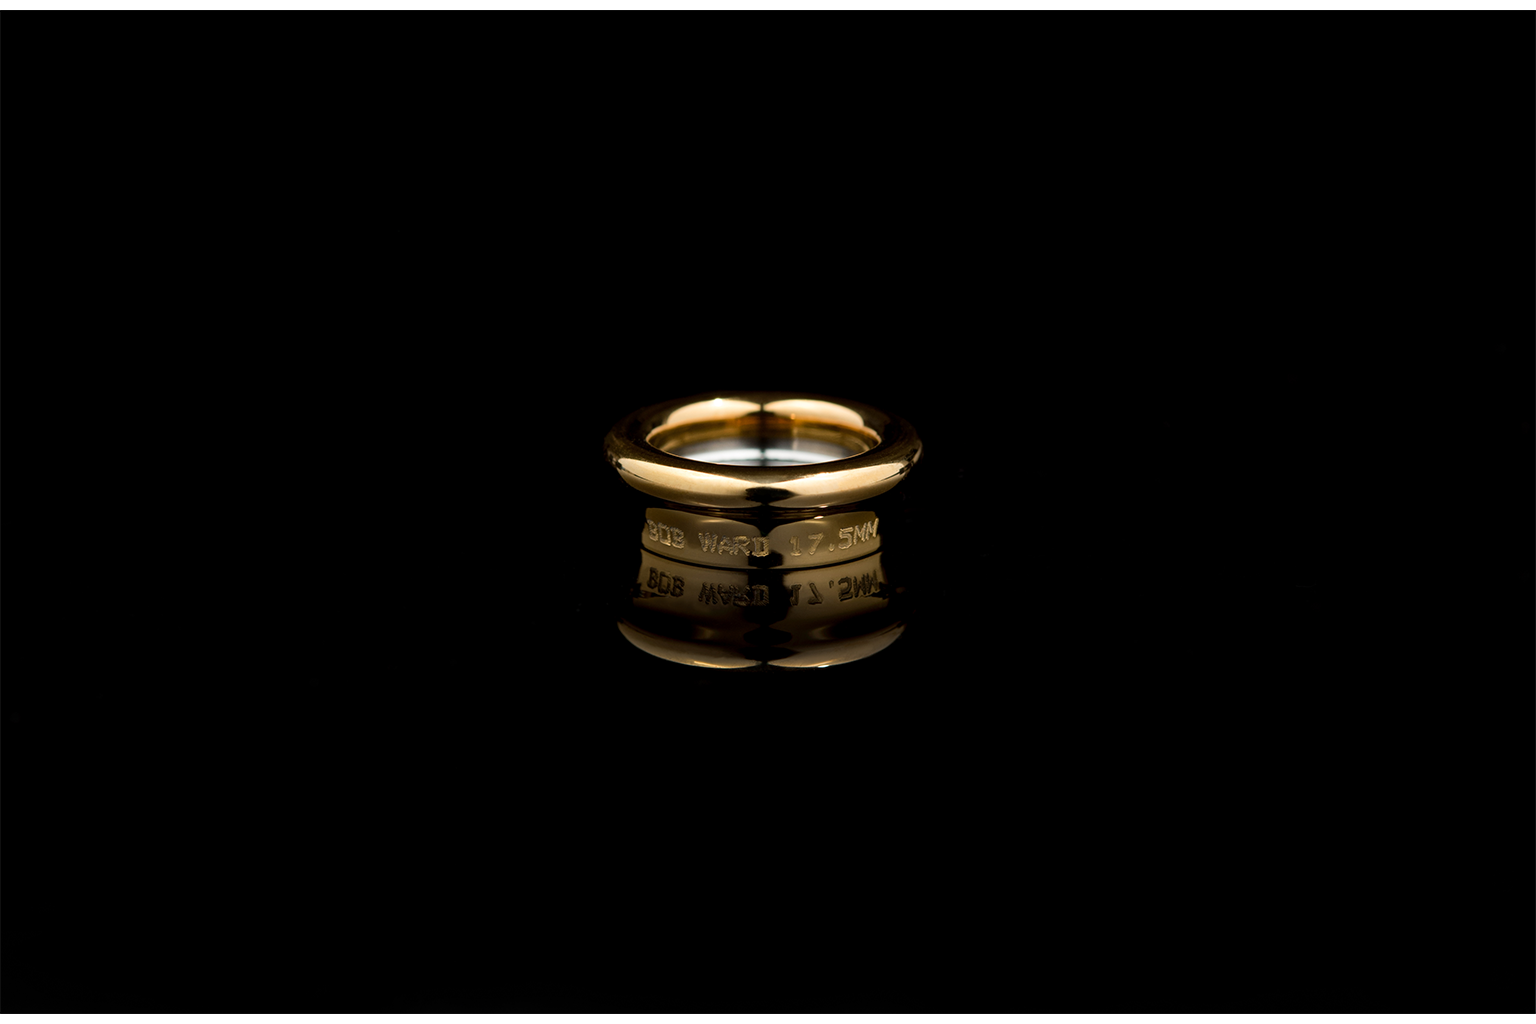 Horn Rim Stainless Gold H-Kote - Bob Ward